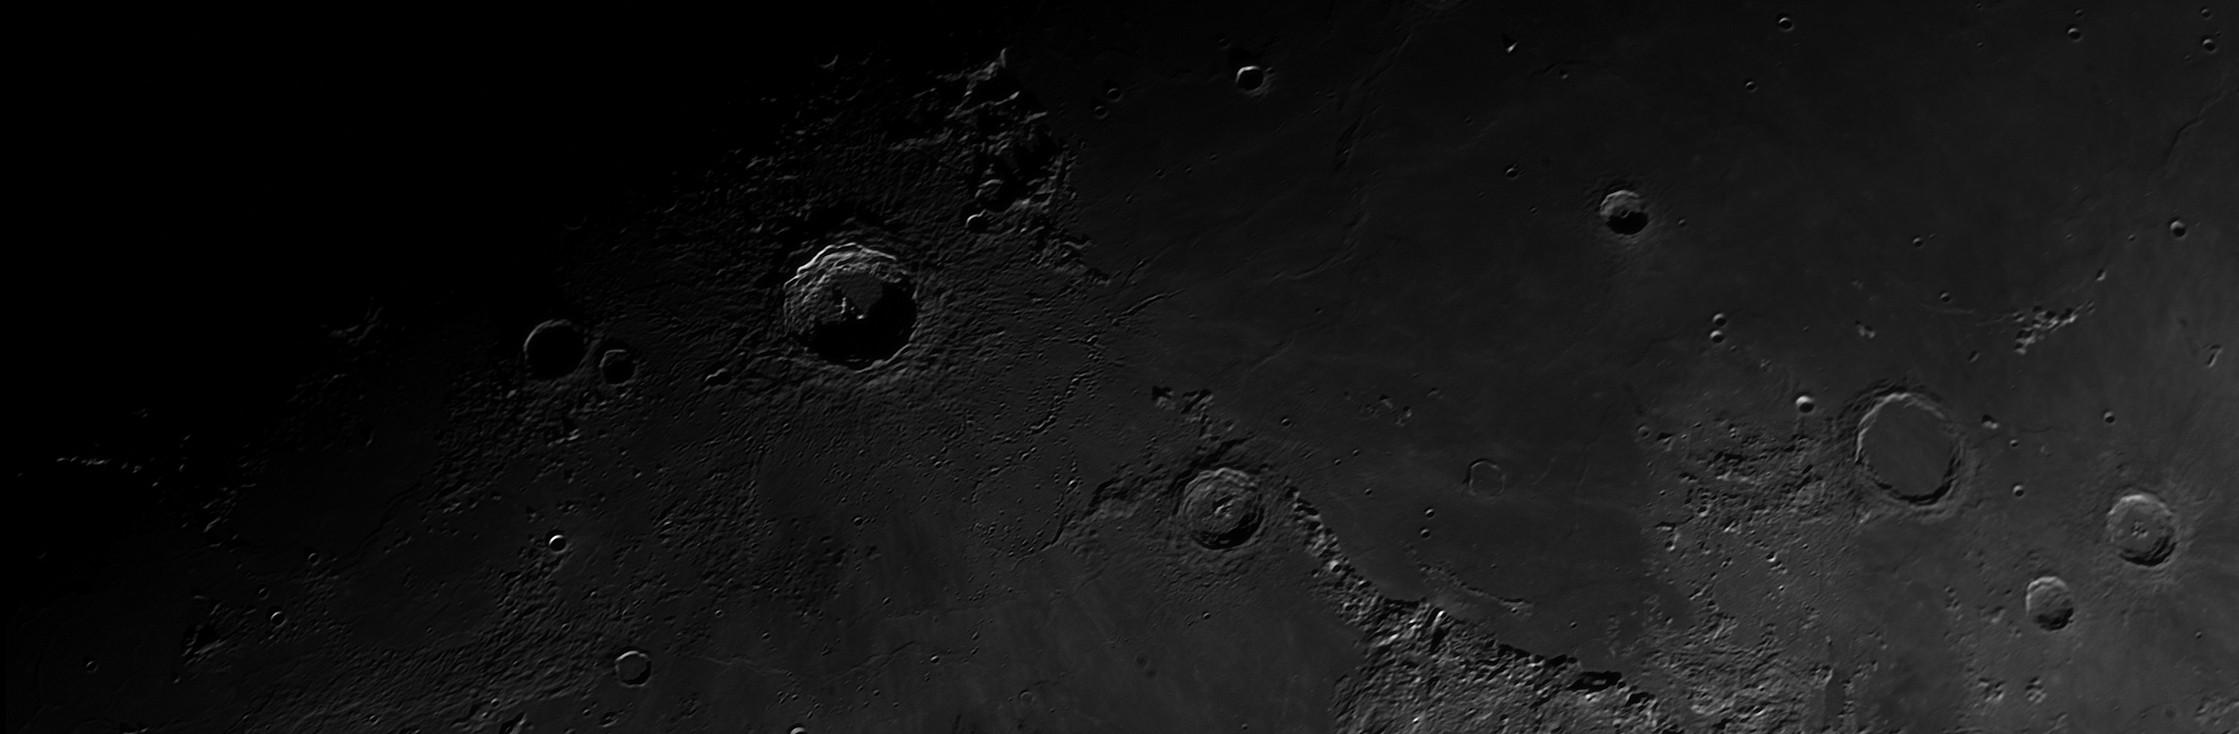 La Lune - Page 3 Panoma13